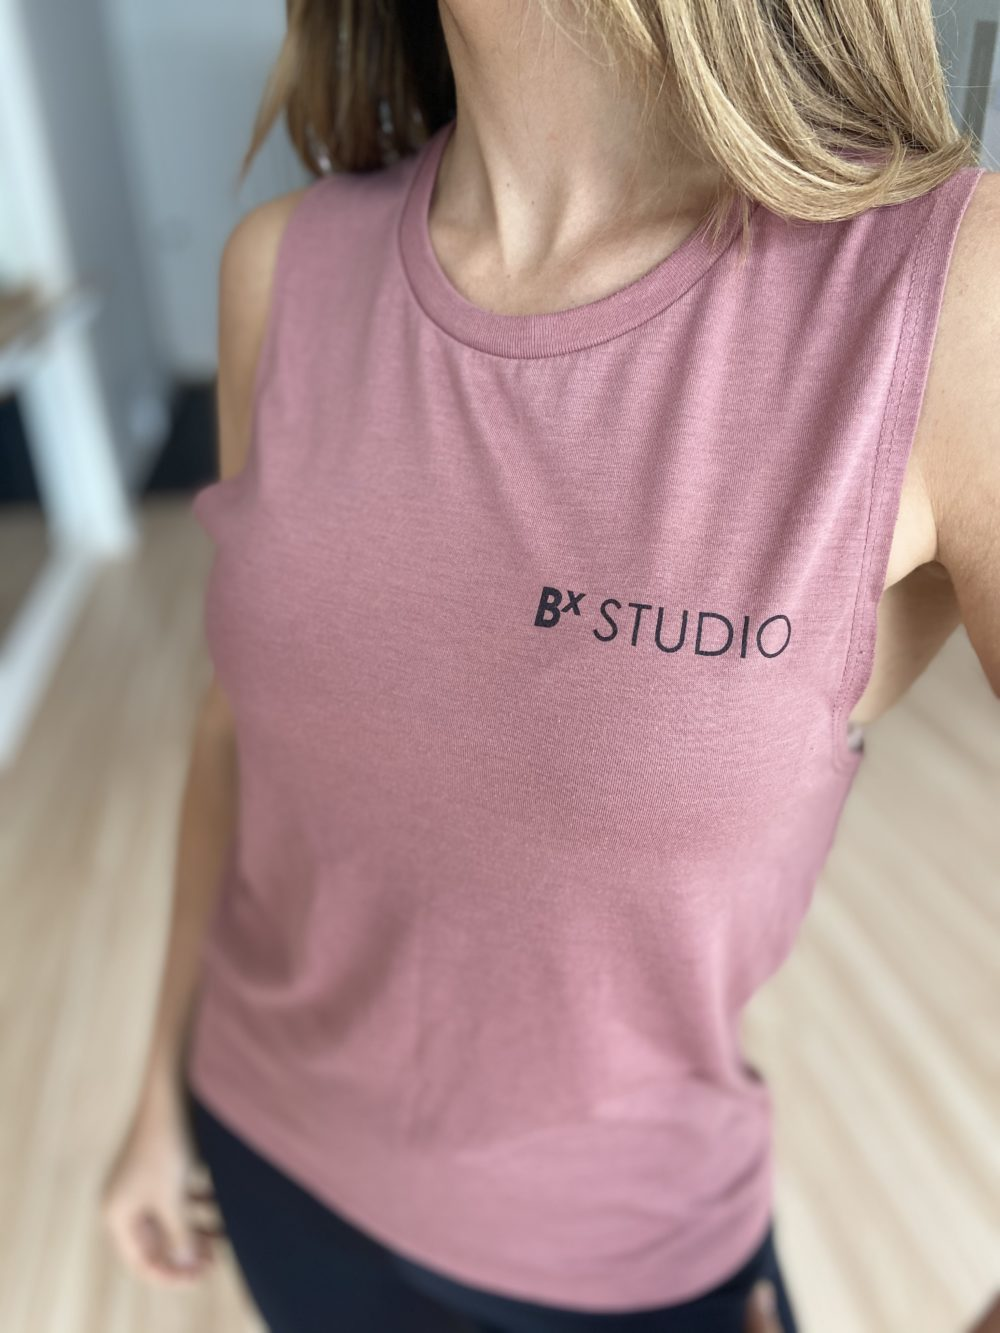 cami-boyfriend-tee-shirt-bx-studio-montreal-boutique